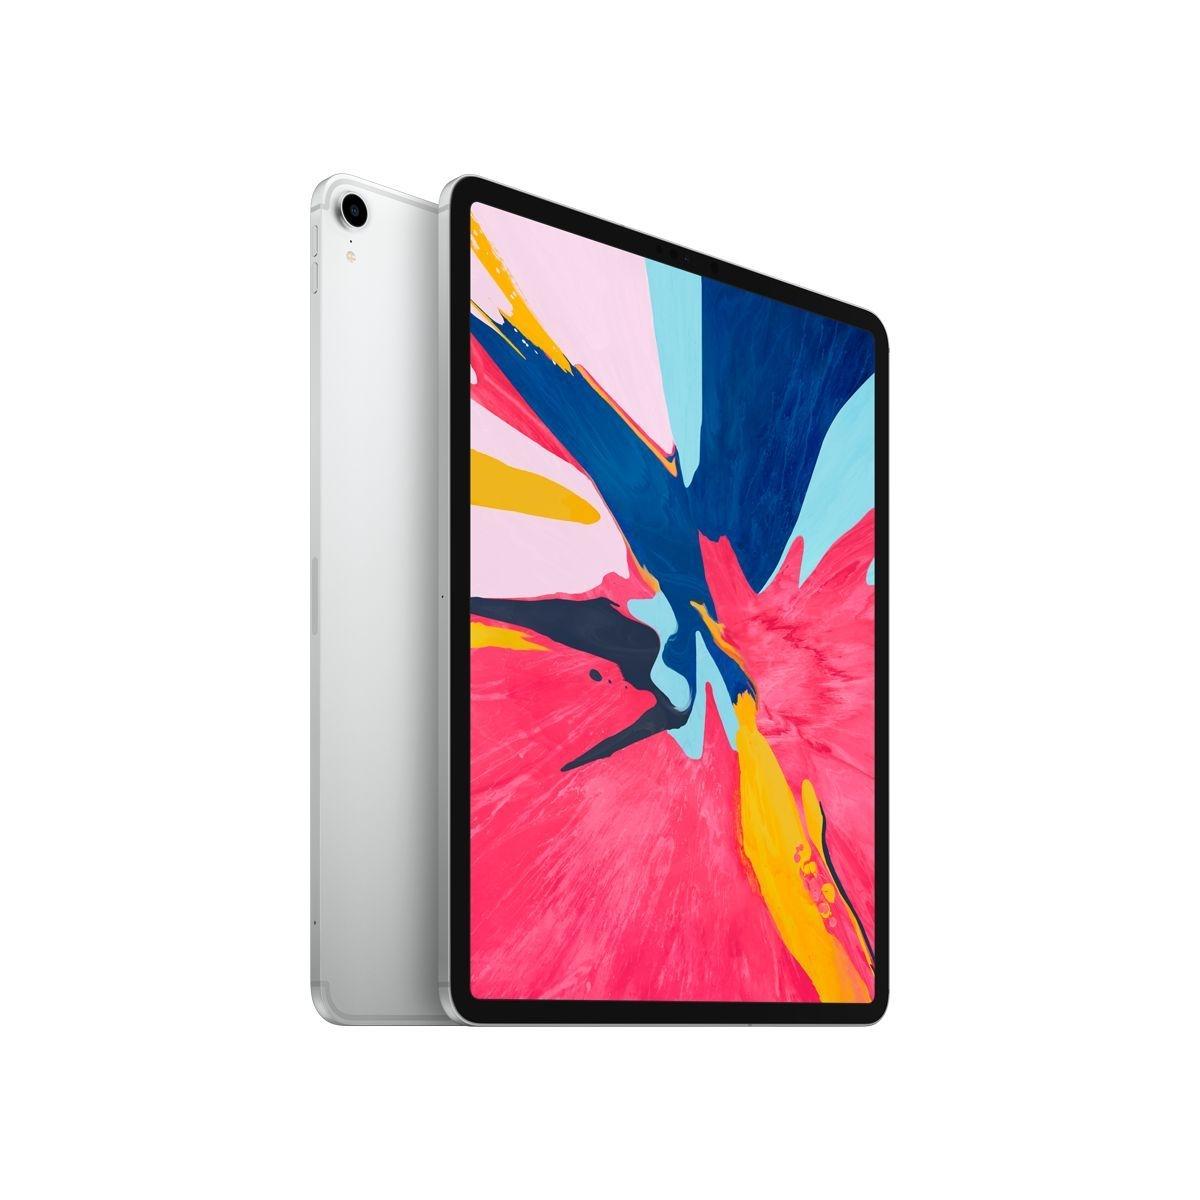 Apple iPad Pro (12.9-inch, Wi-Fi, 256GB)